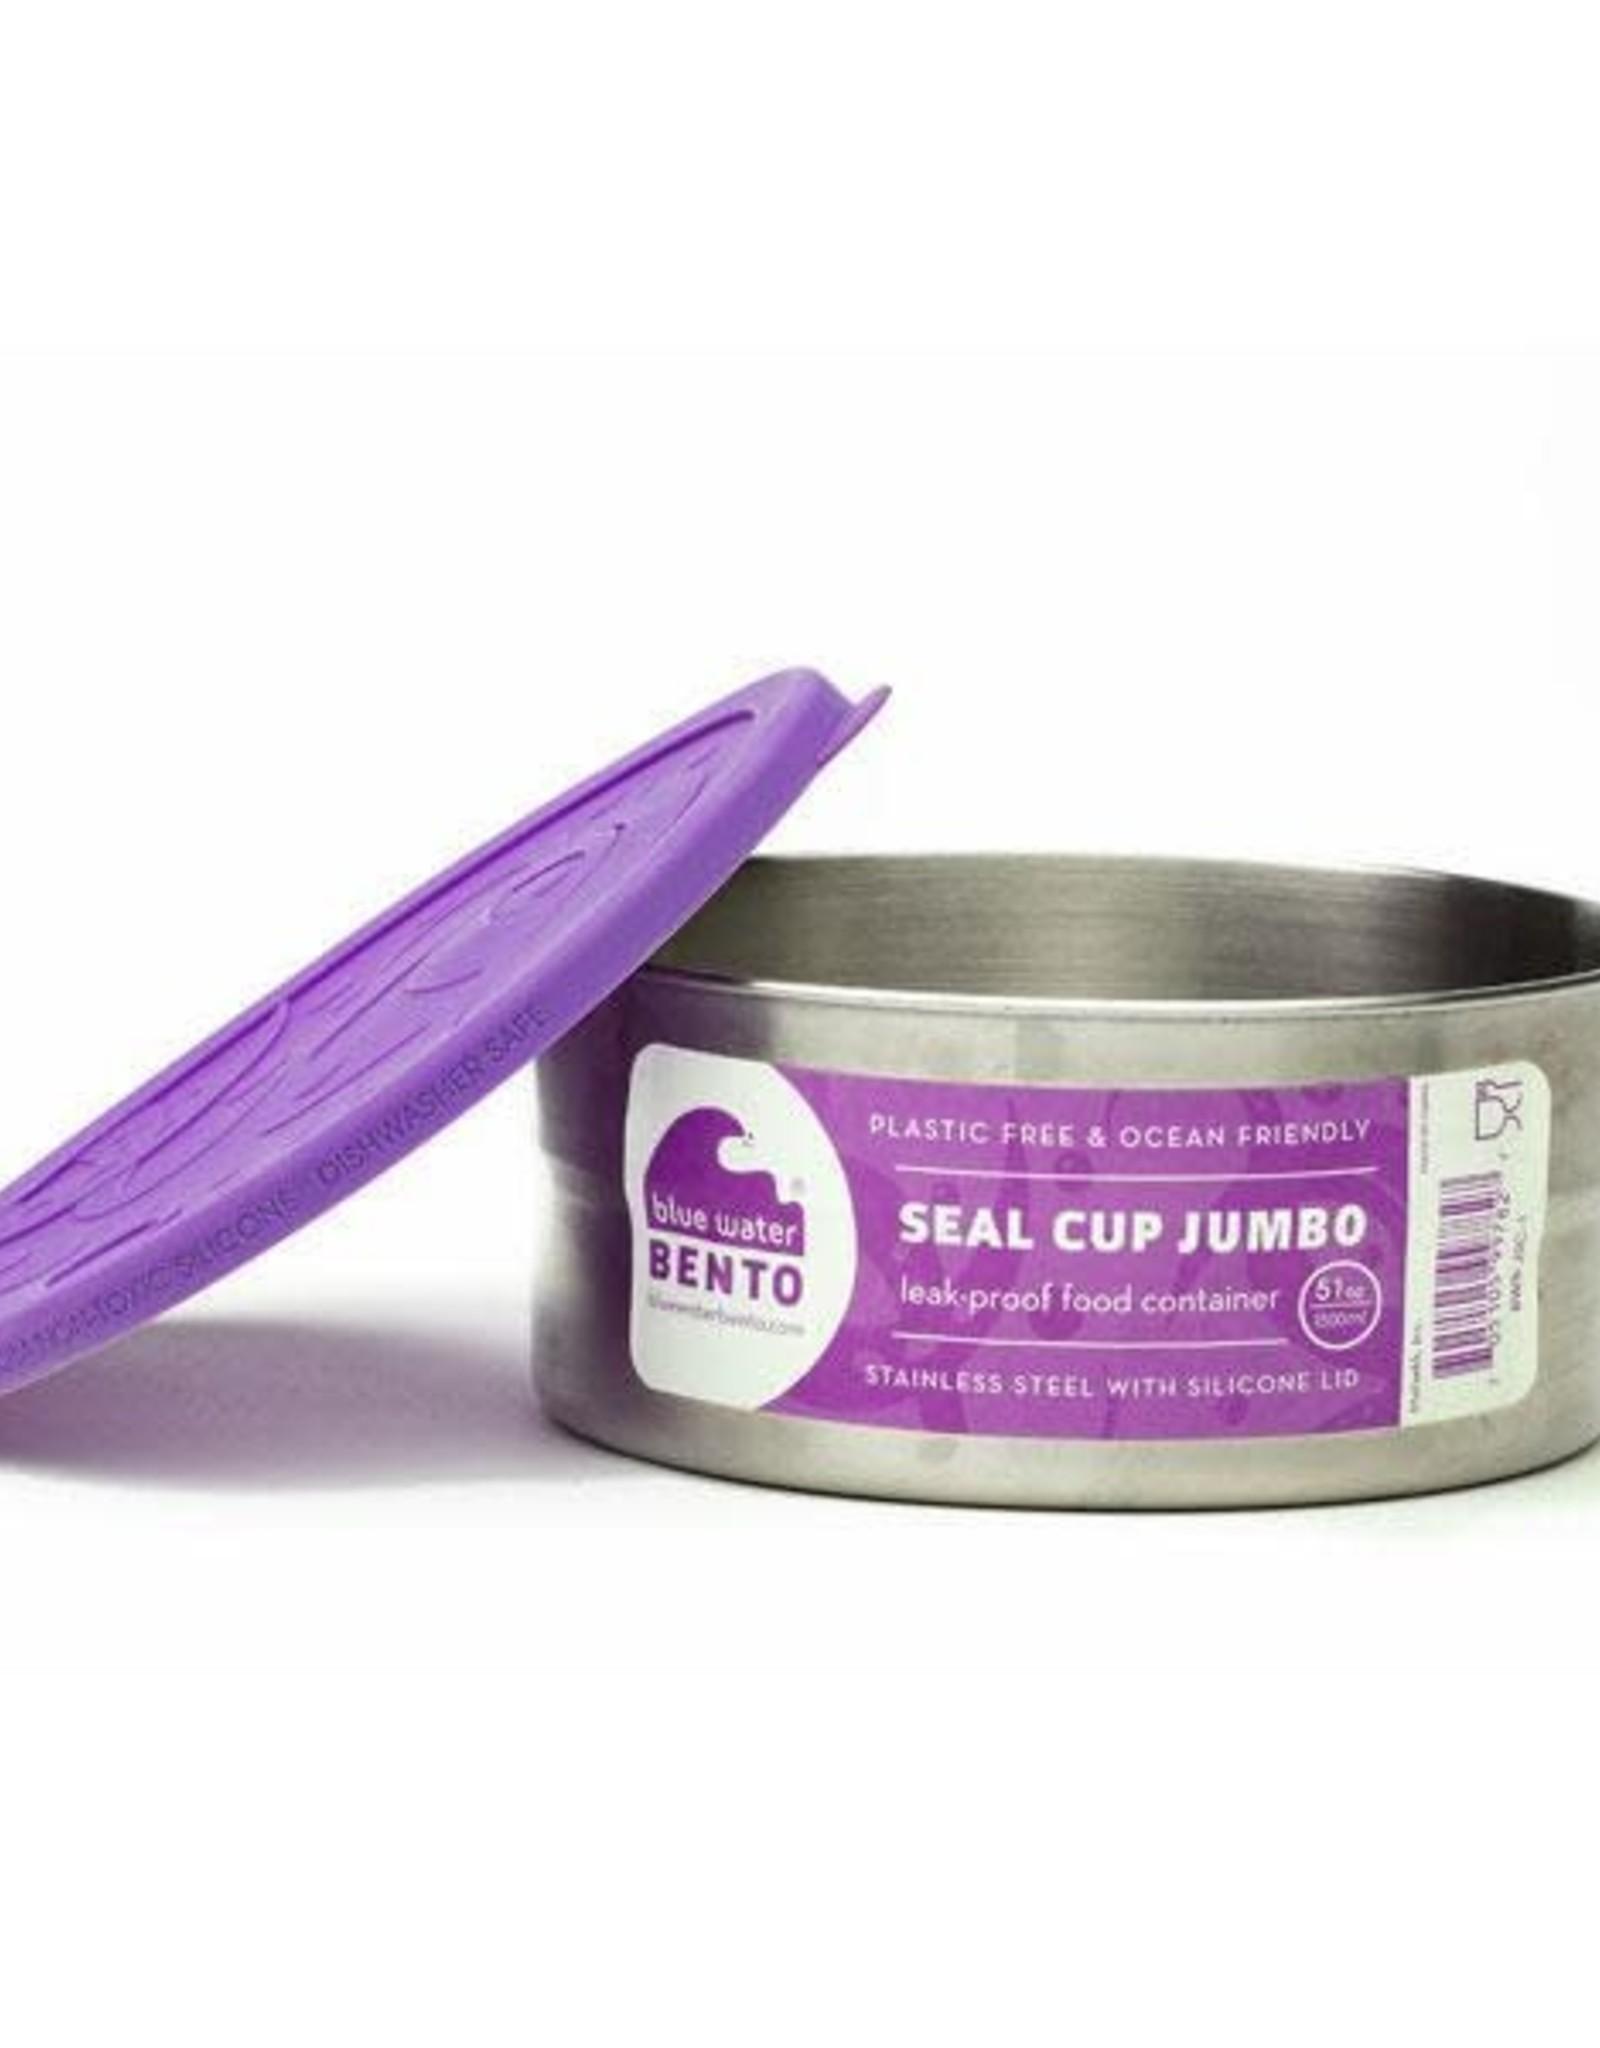 Seal Cup Jumbo